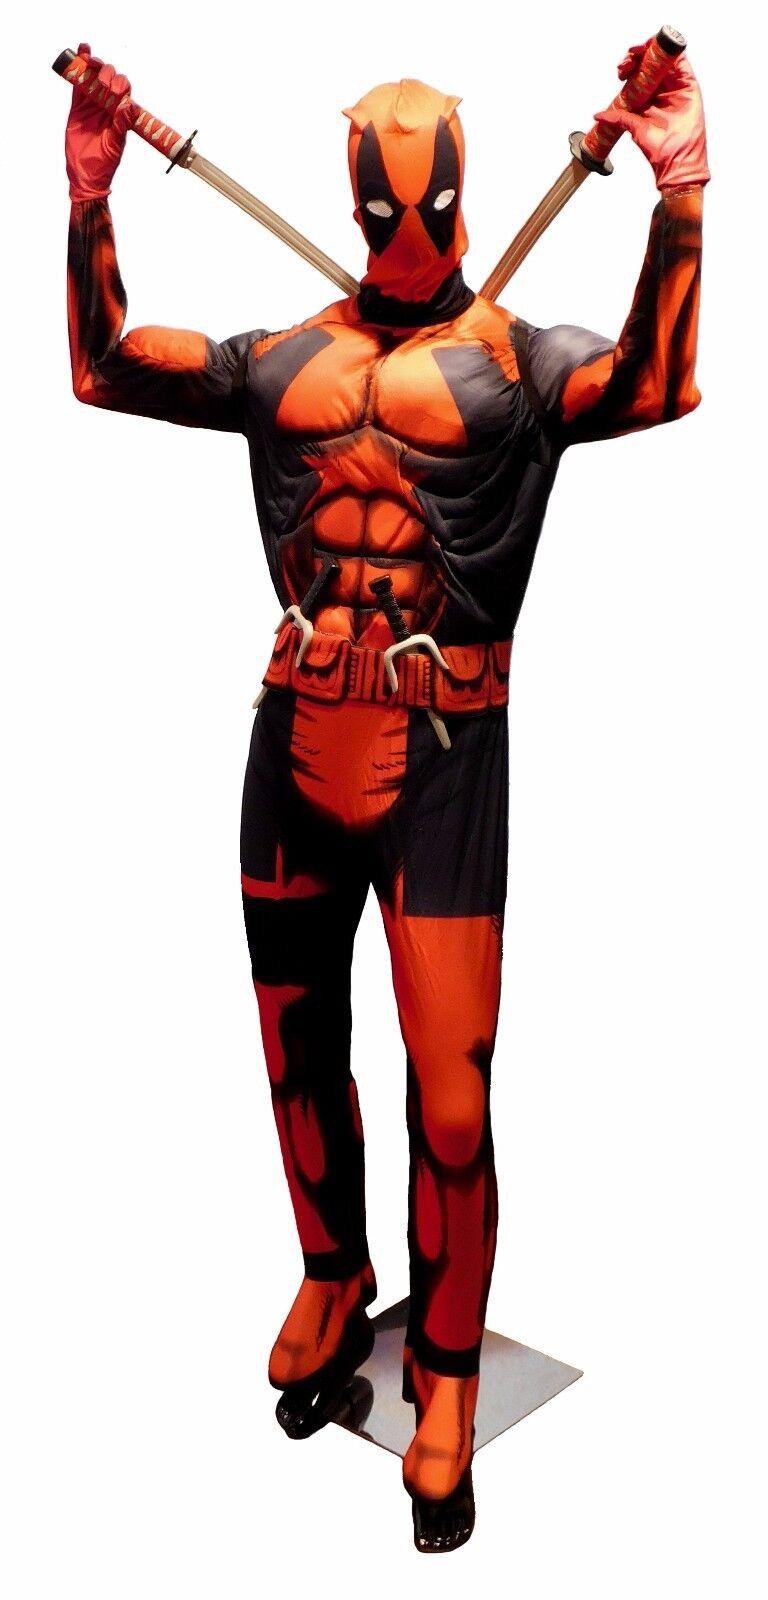 ee54db3d3d766b ... DEADPOOL DeLuxe Muskel Anzug Kostüm 10-tlg.komplett M Erwachsene MARVEL  Fasching